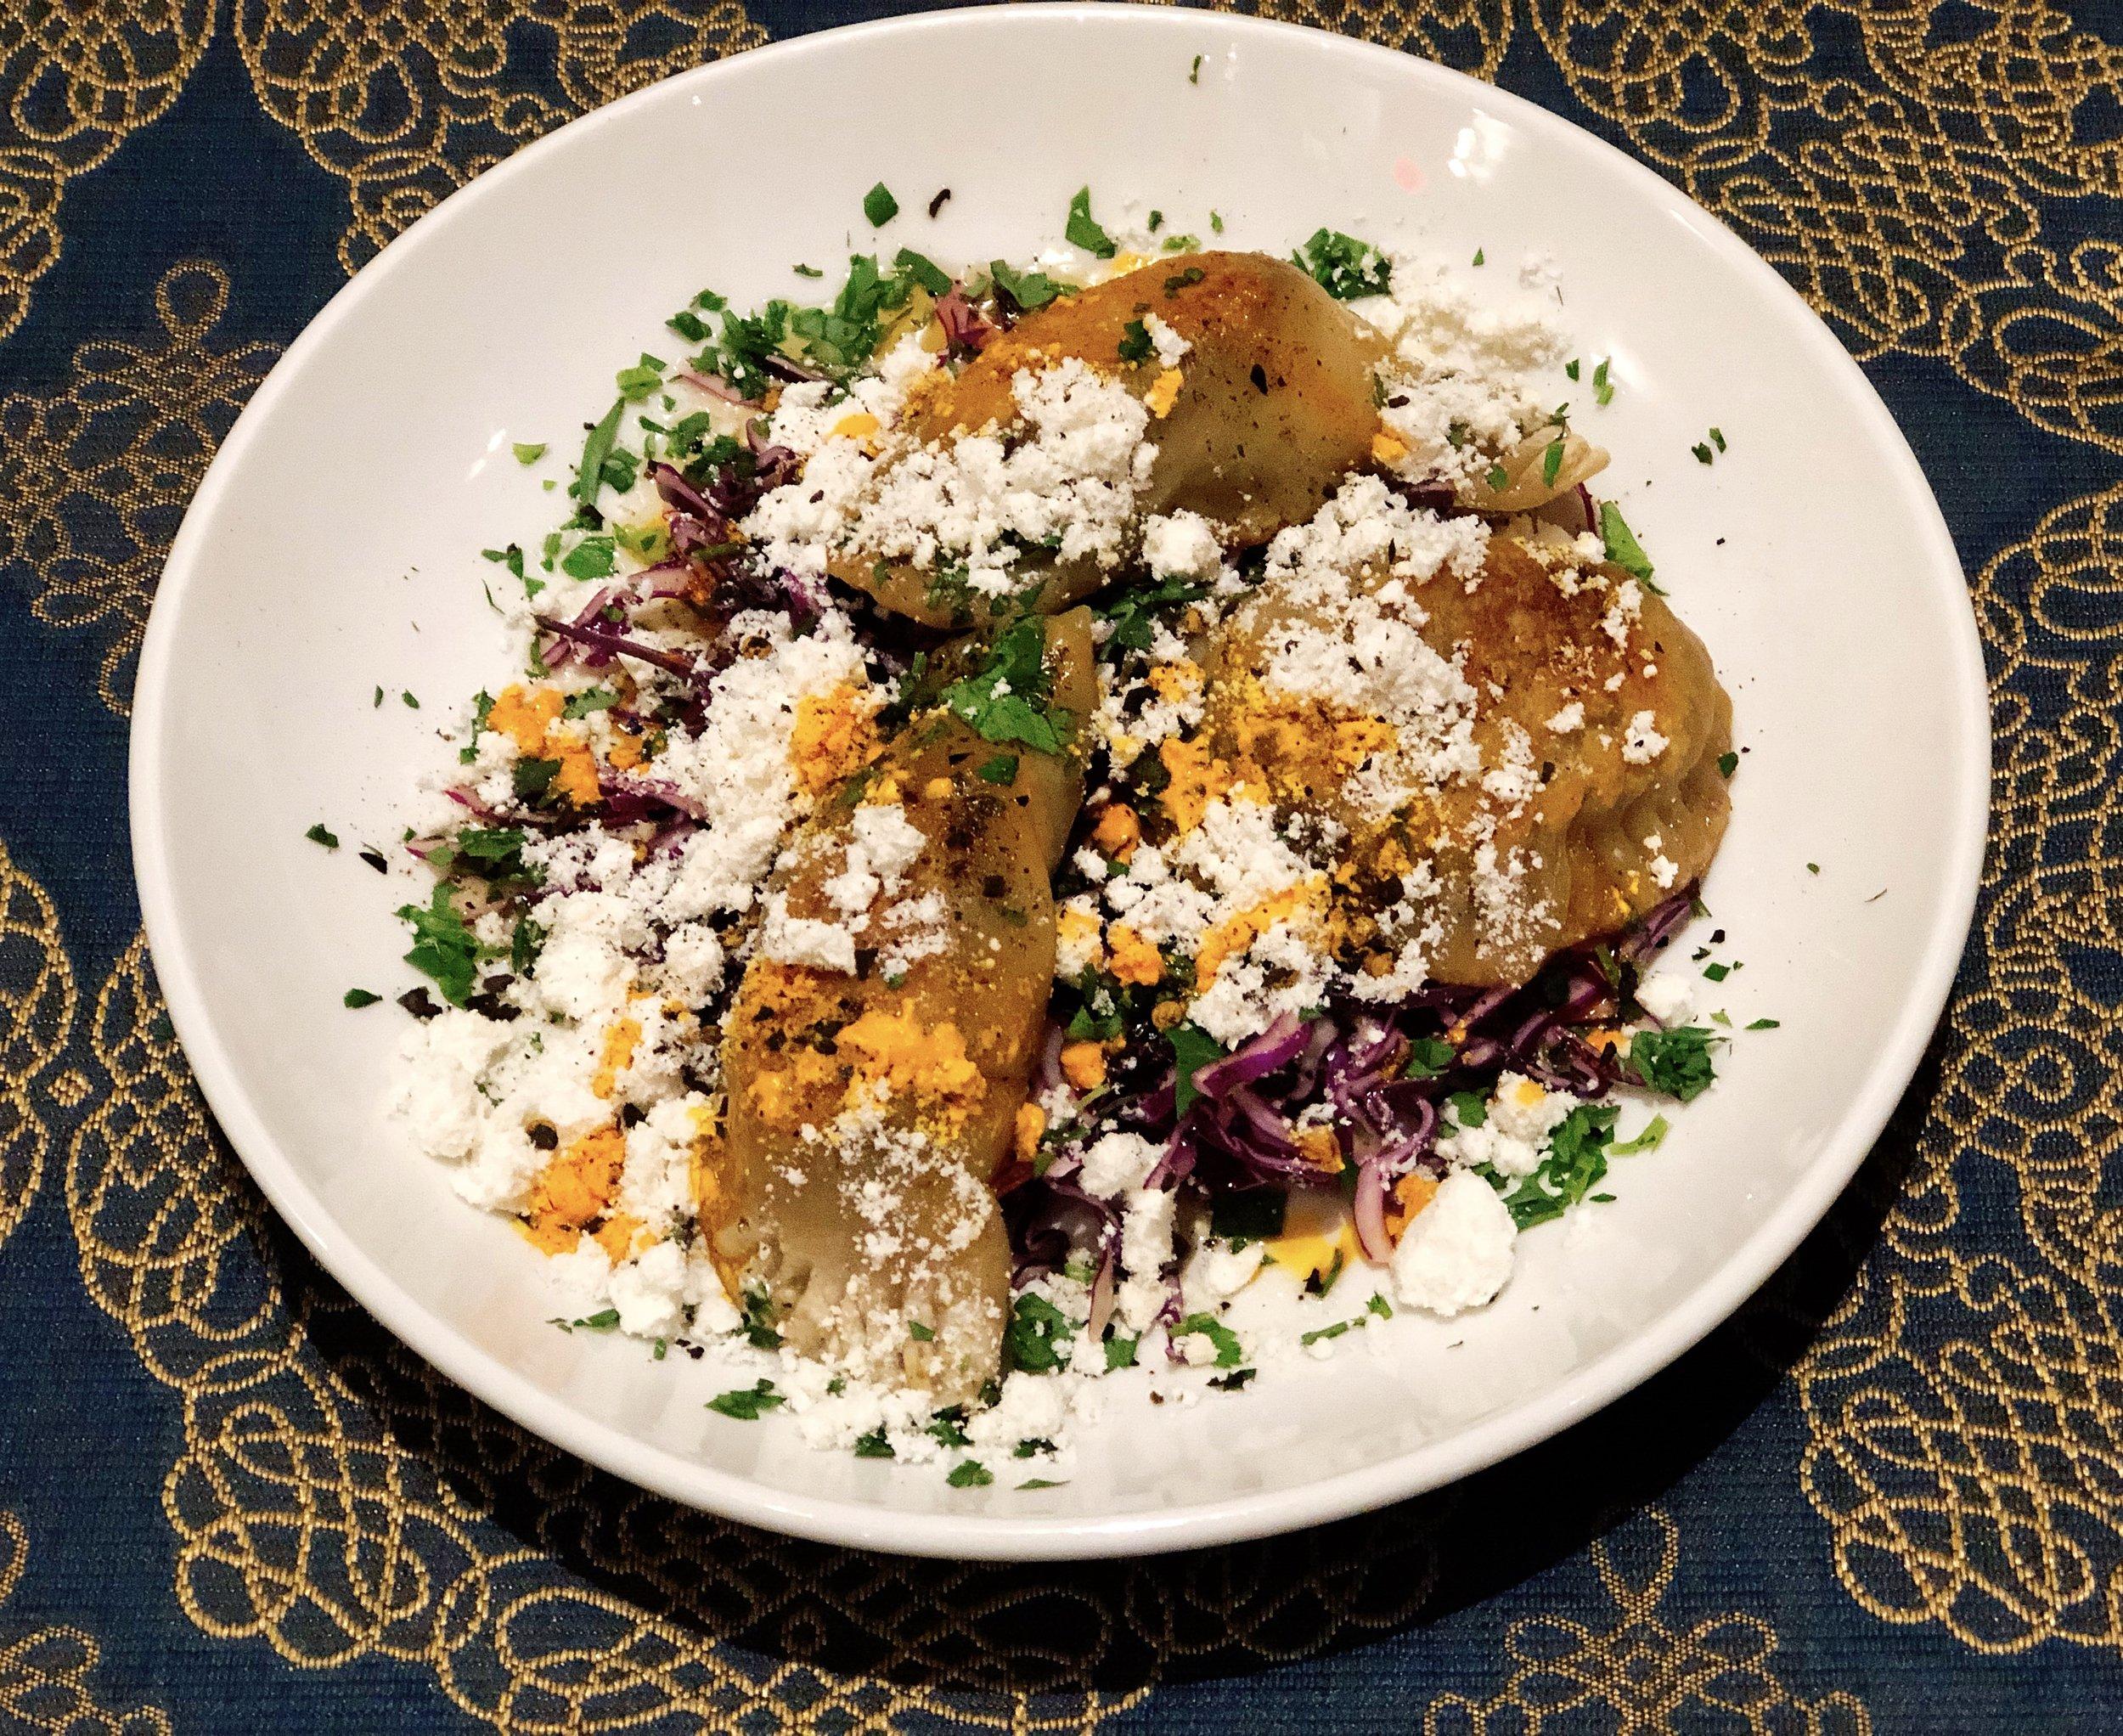 Seared Annatto Pork Dumplings | Cabbage + Brown Butter + Herbs